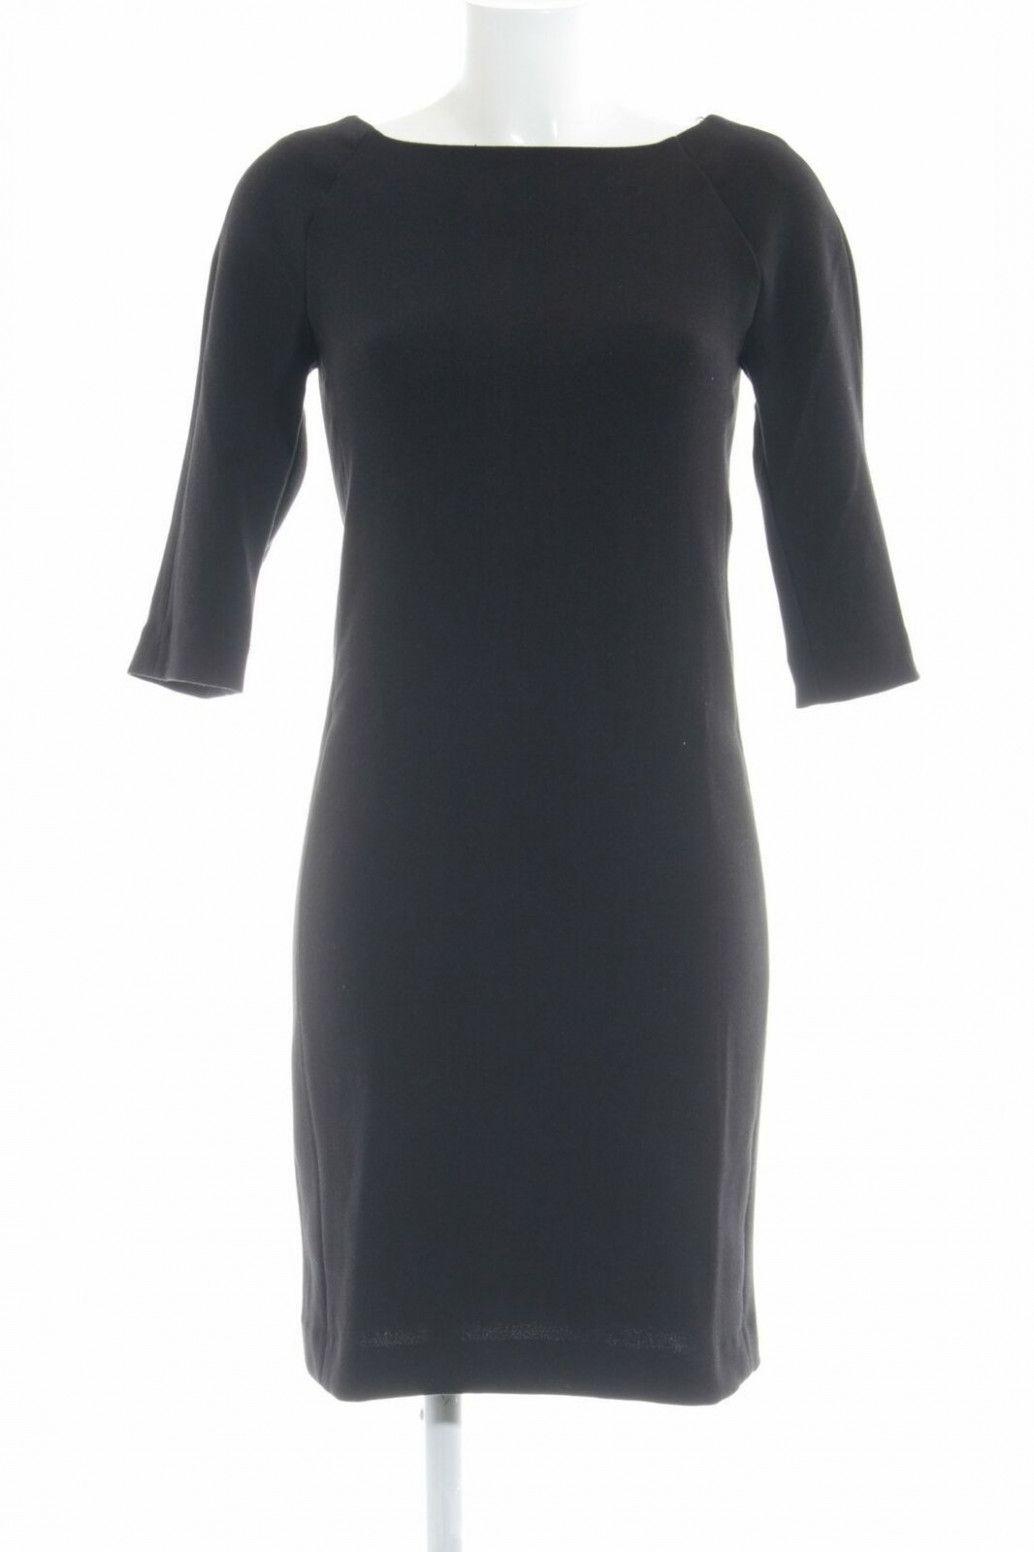 5 Festkleid Gr 5 in 5  Etuikleid, Kleider, Kleid tom tailor